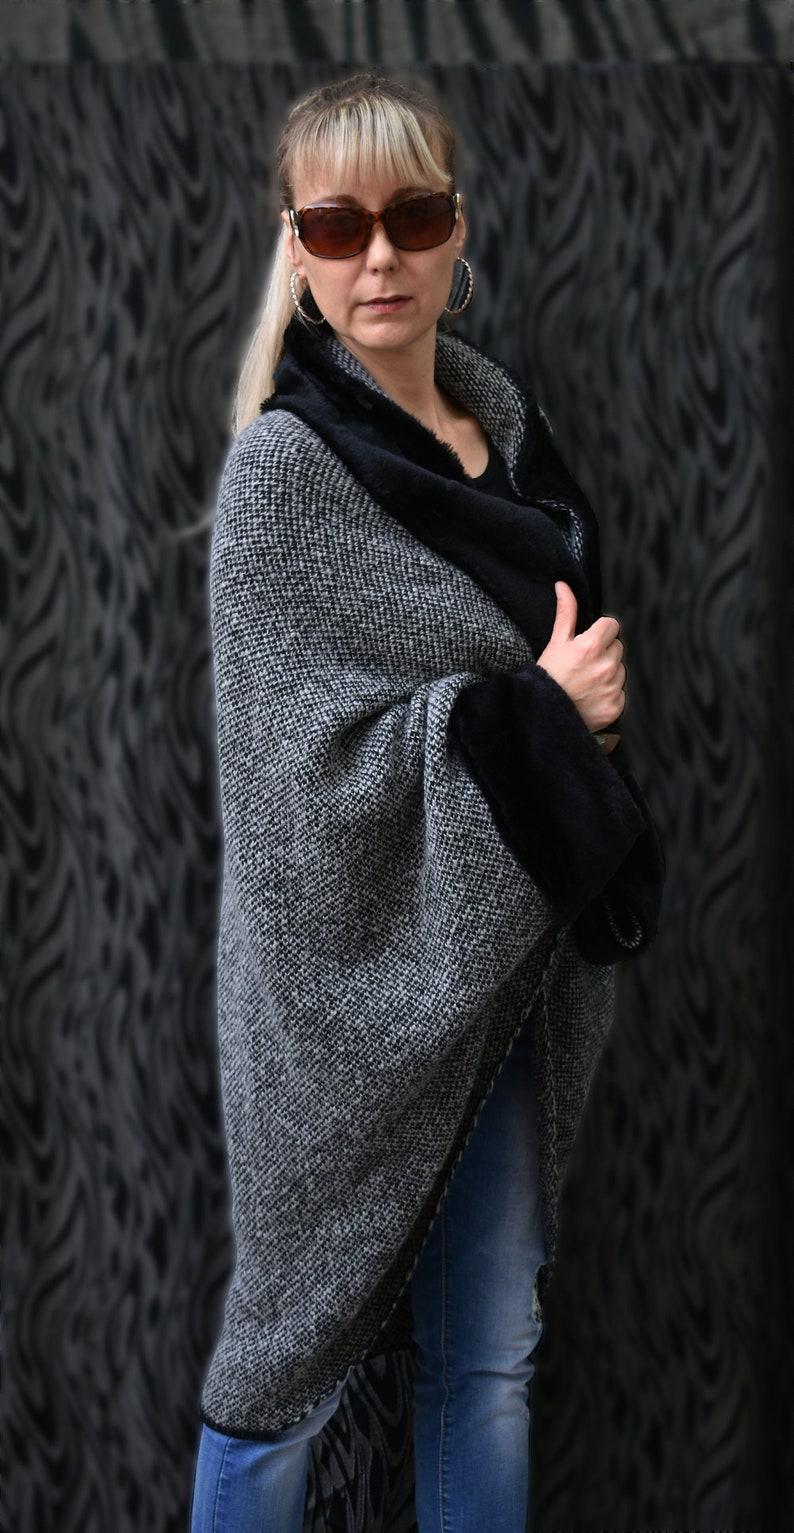 Women Knitt Mohair Wool  Cardigan Poncho Sweater Oversized Asymmetric Coat Top  Melange